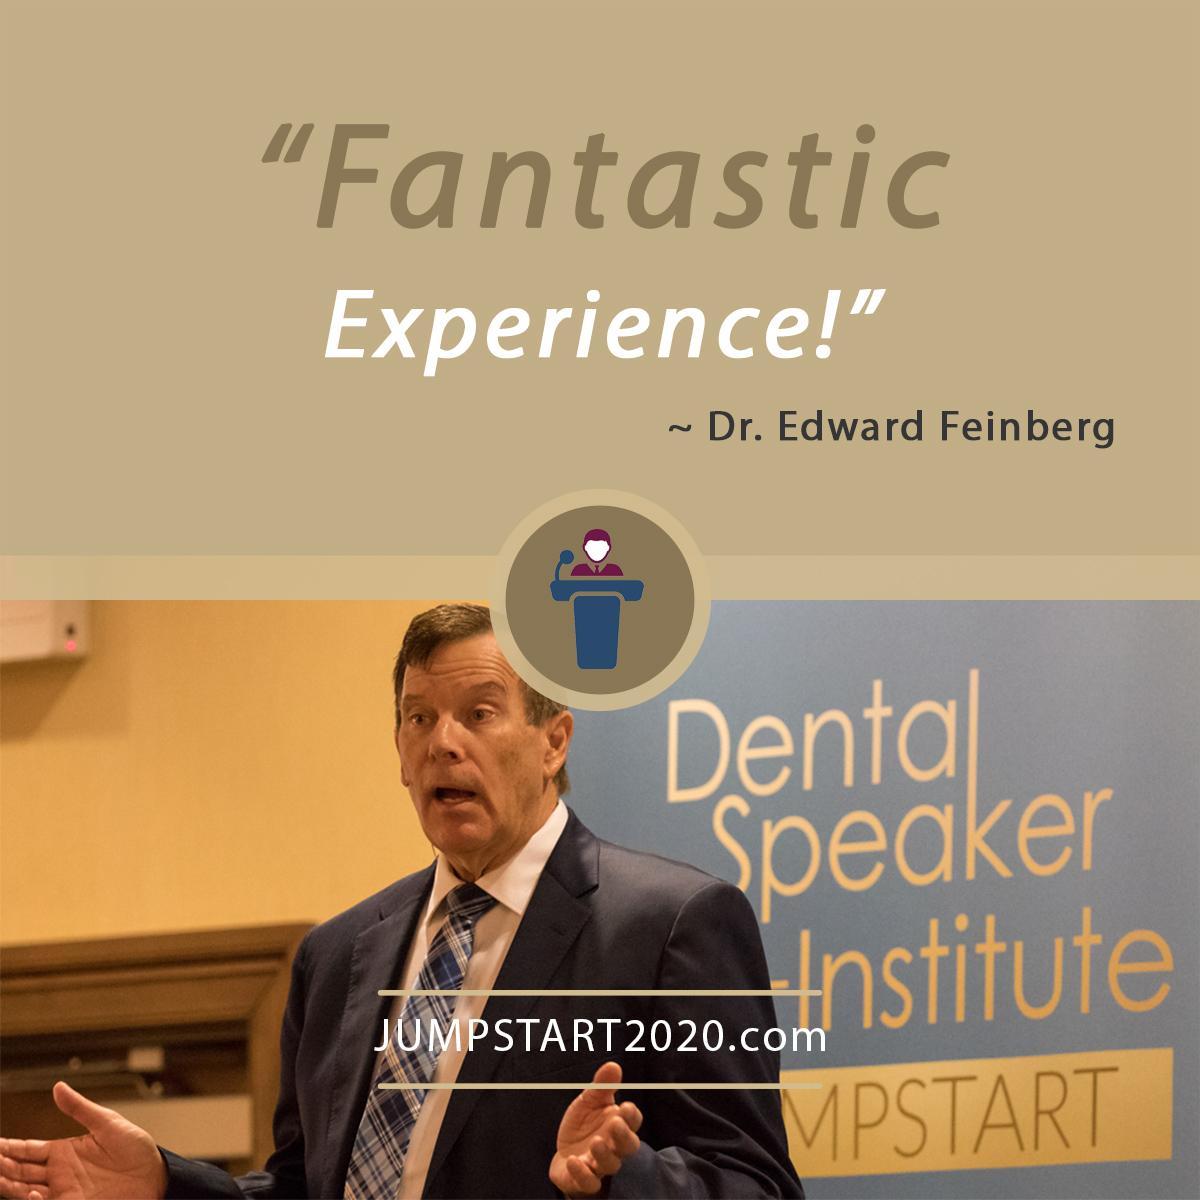 Leslie Canham review on Jumpstart Dental Meeting